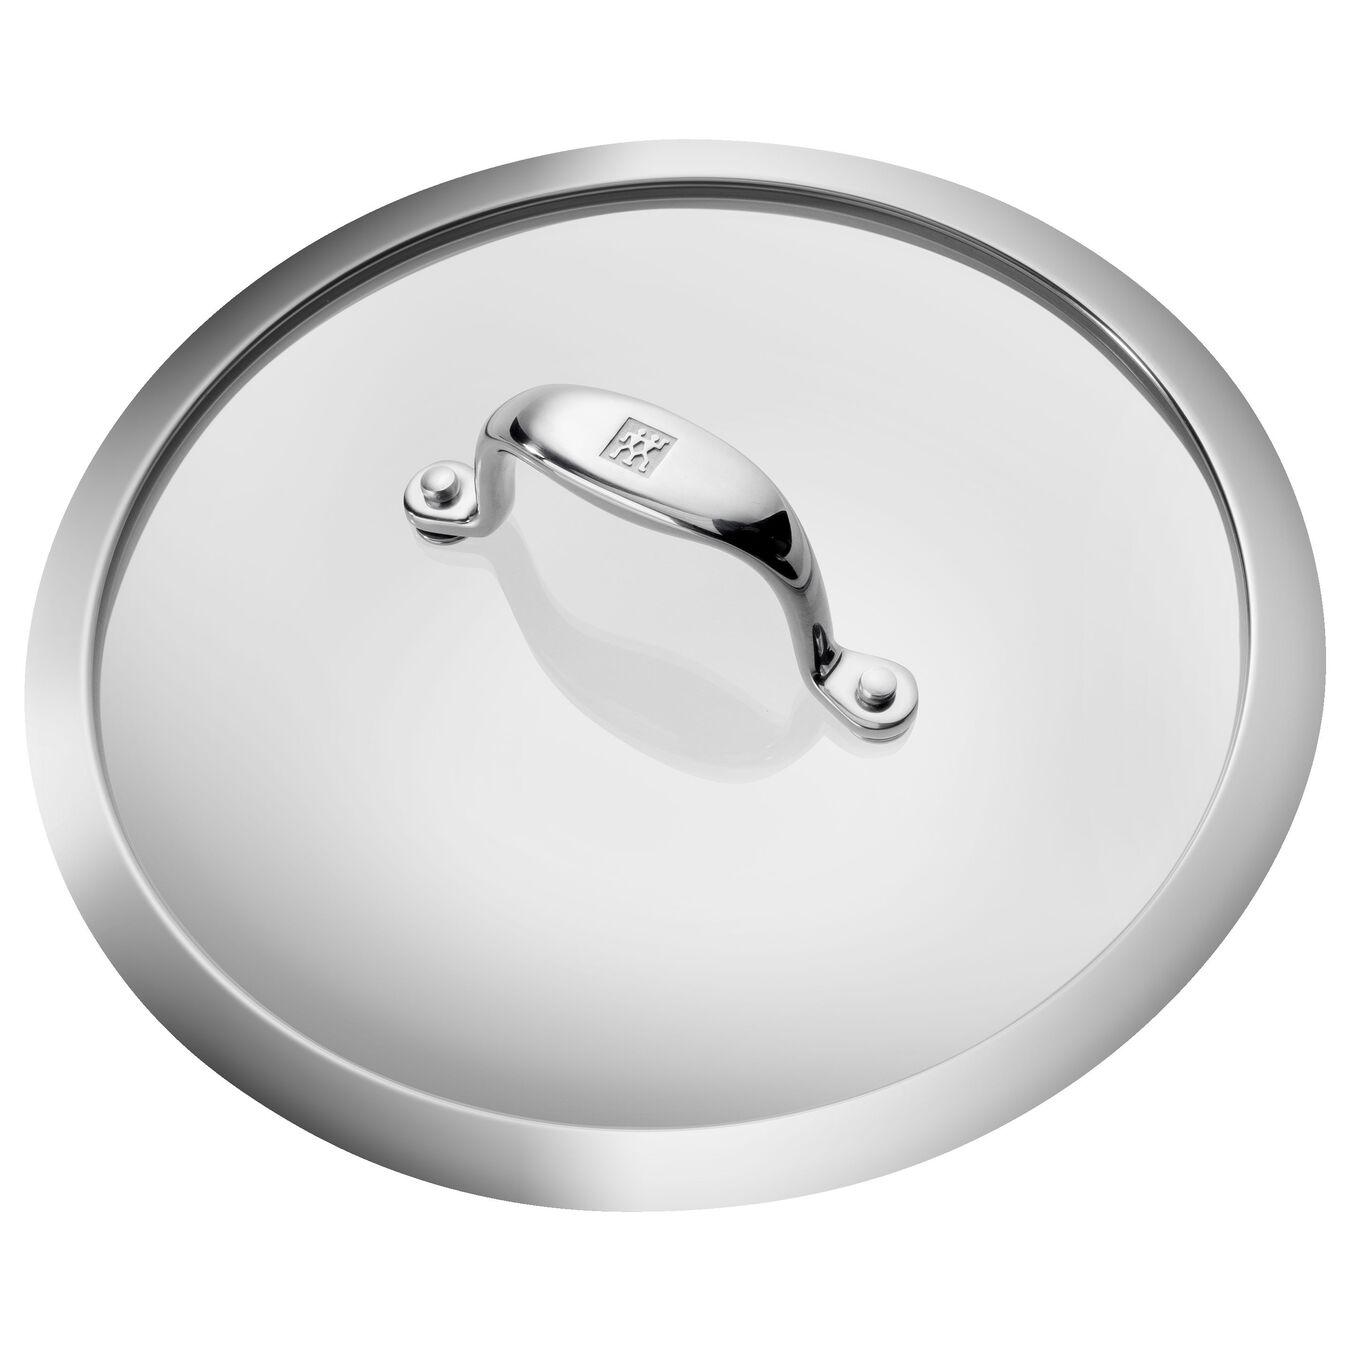 Aluminum round Sauce pan, Silver-Black,,large 6